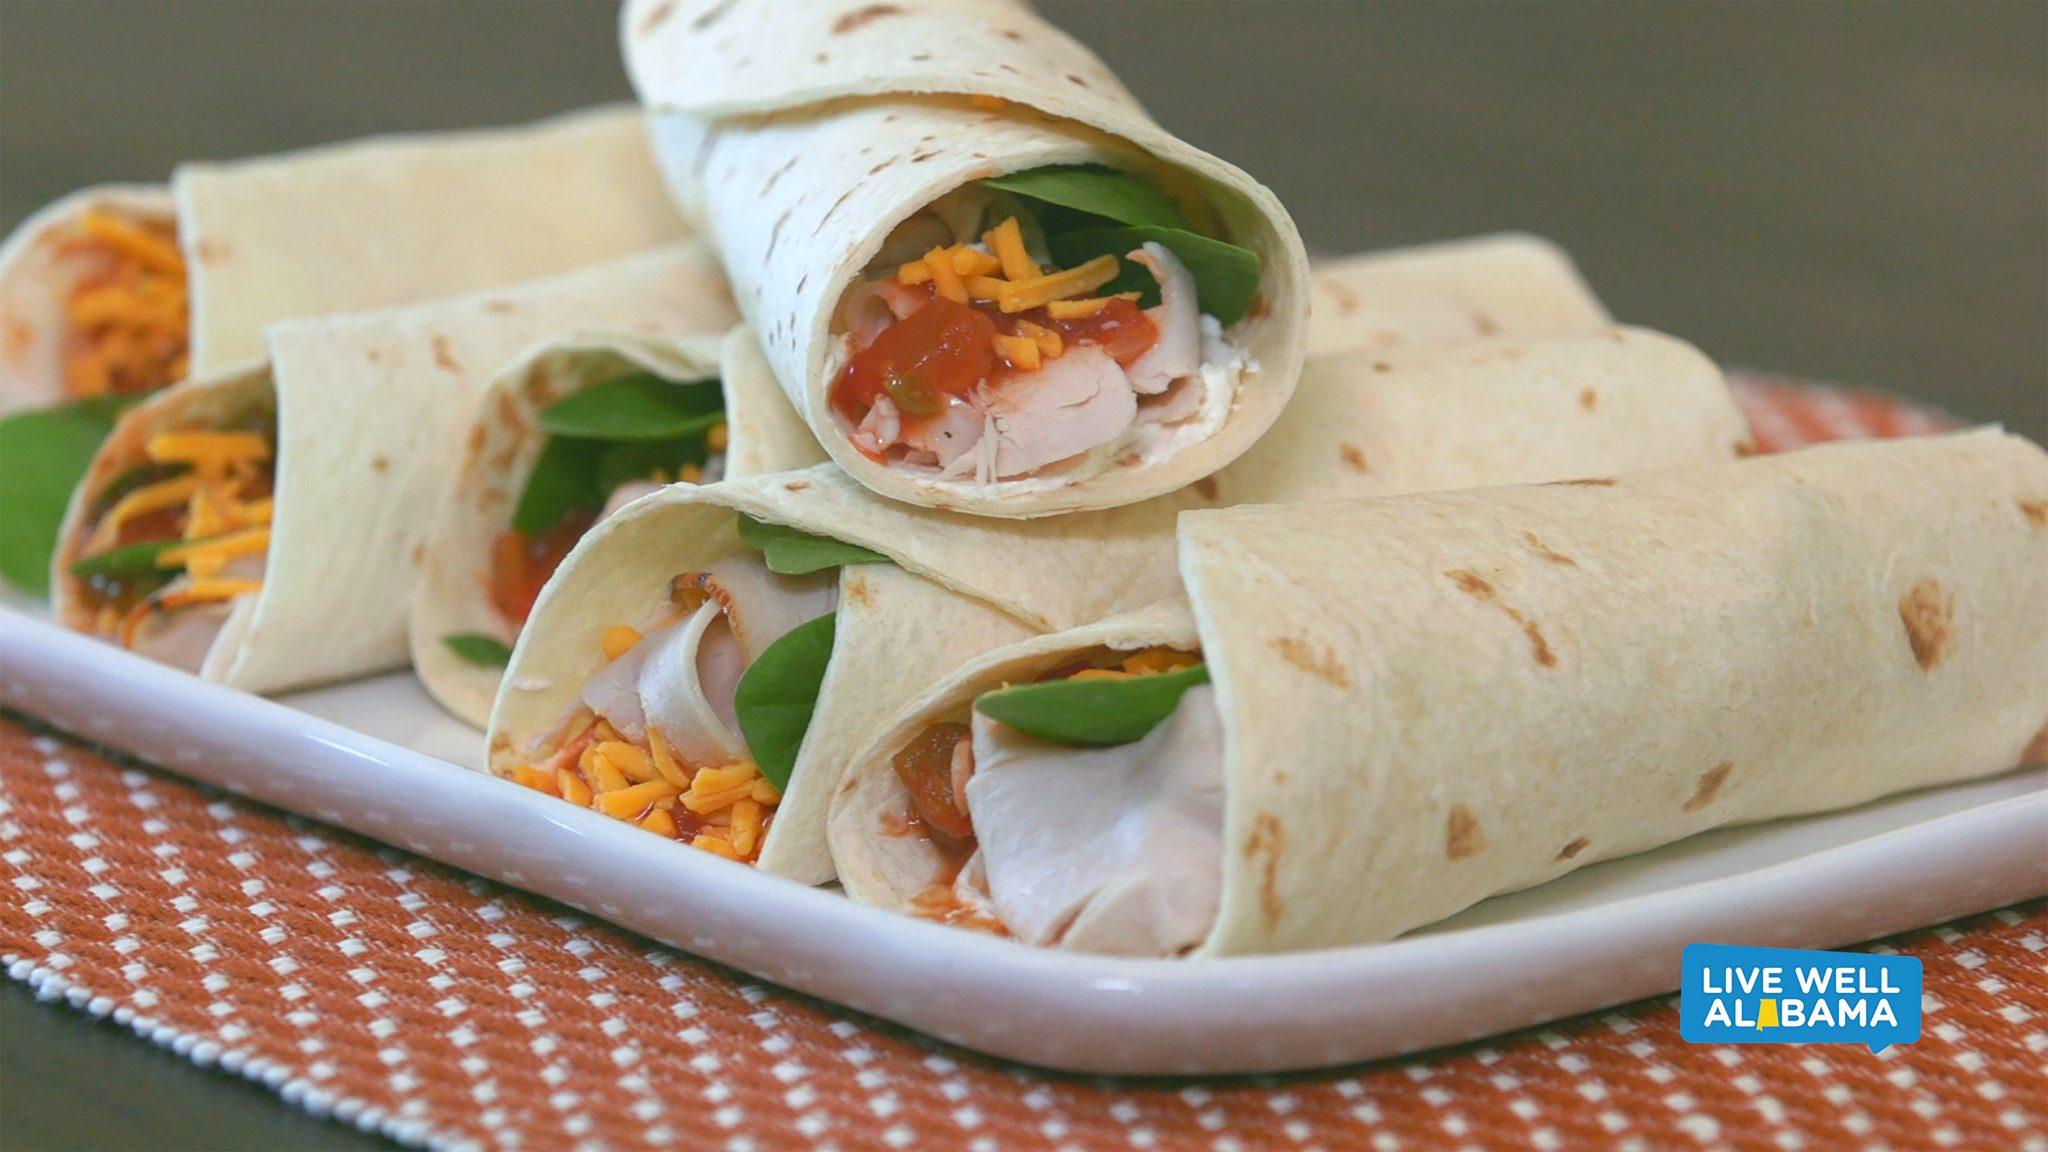 Live Well Alabama recipe, Turkey Spinach Wraps.